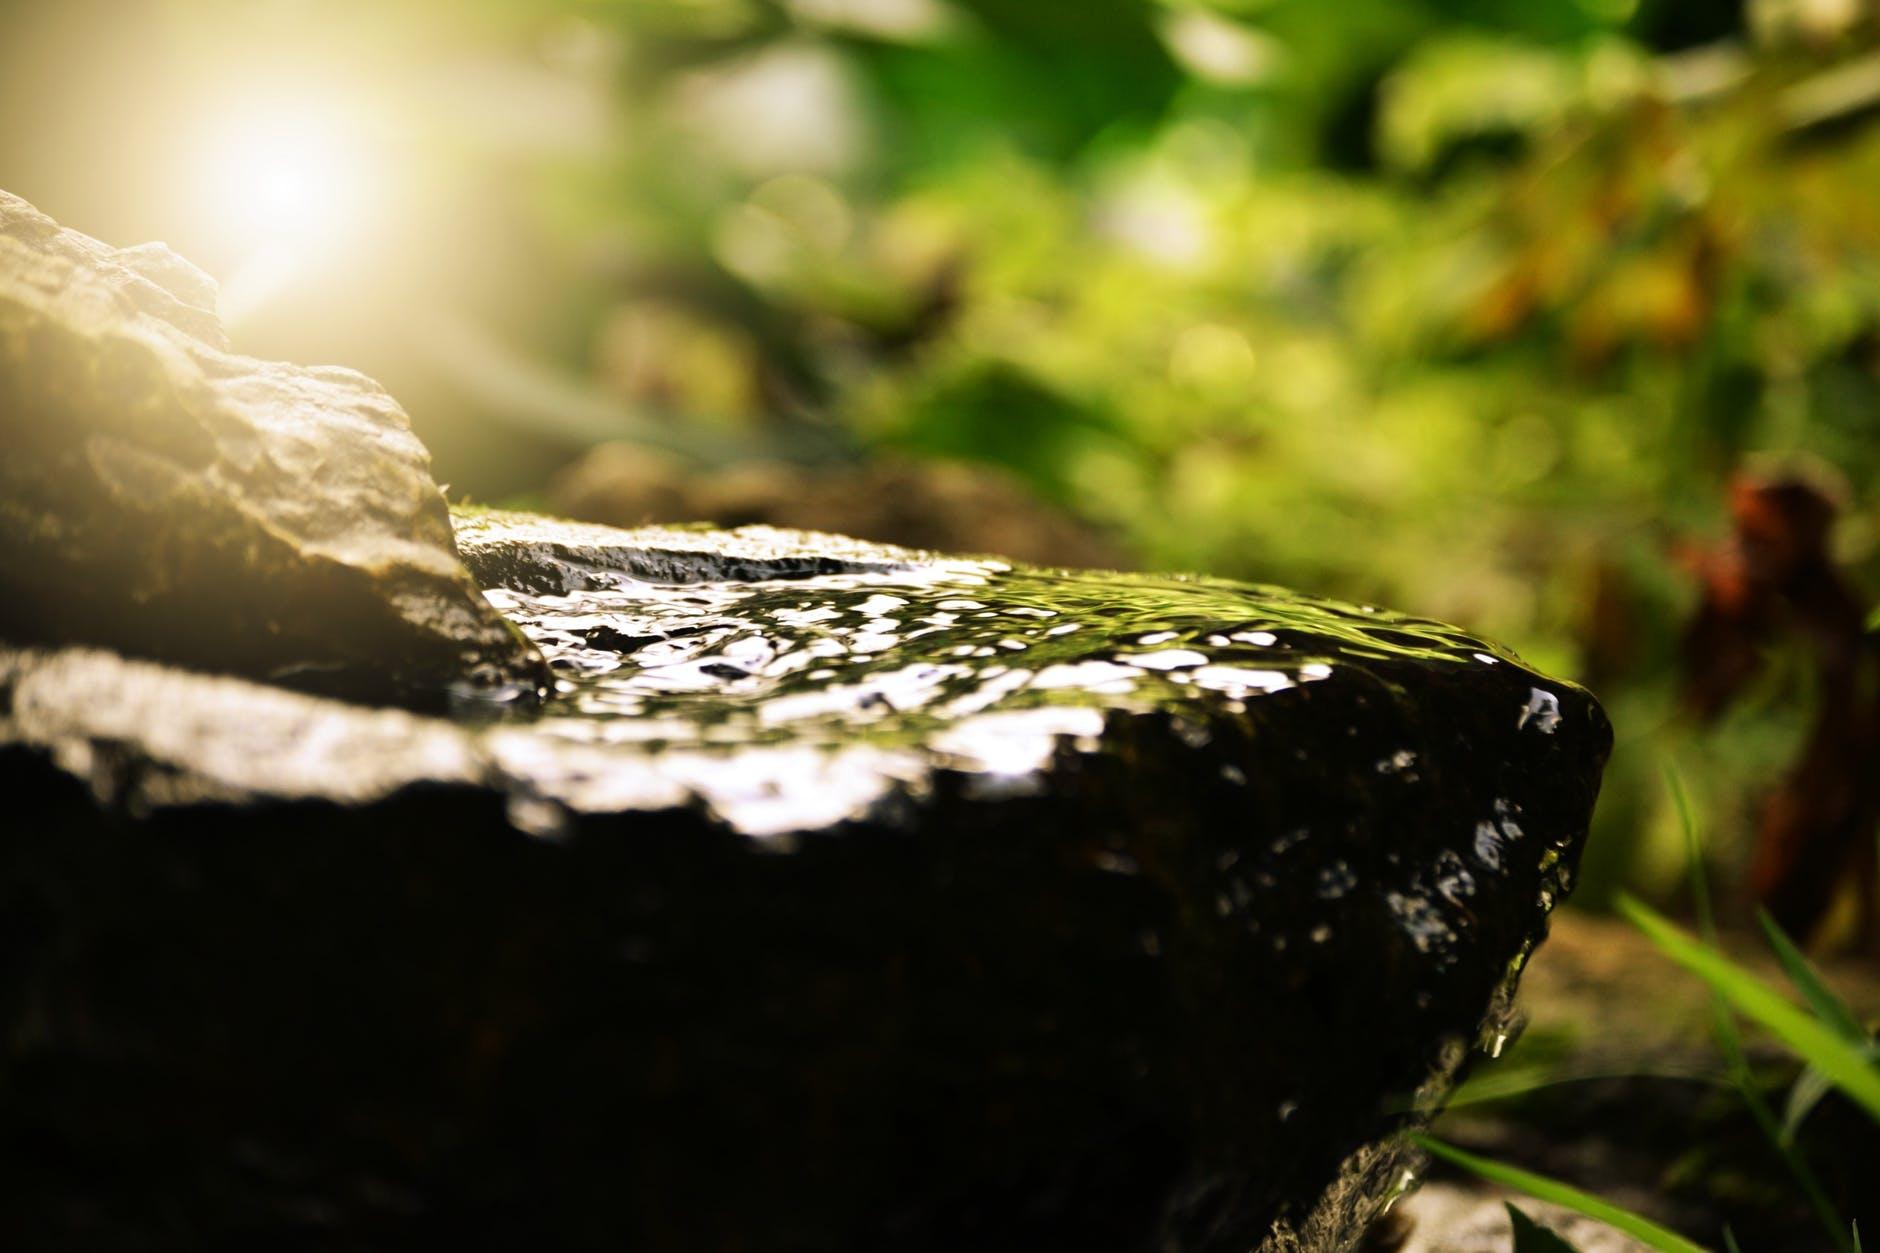 blur calm close up daylight